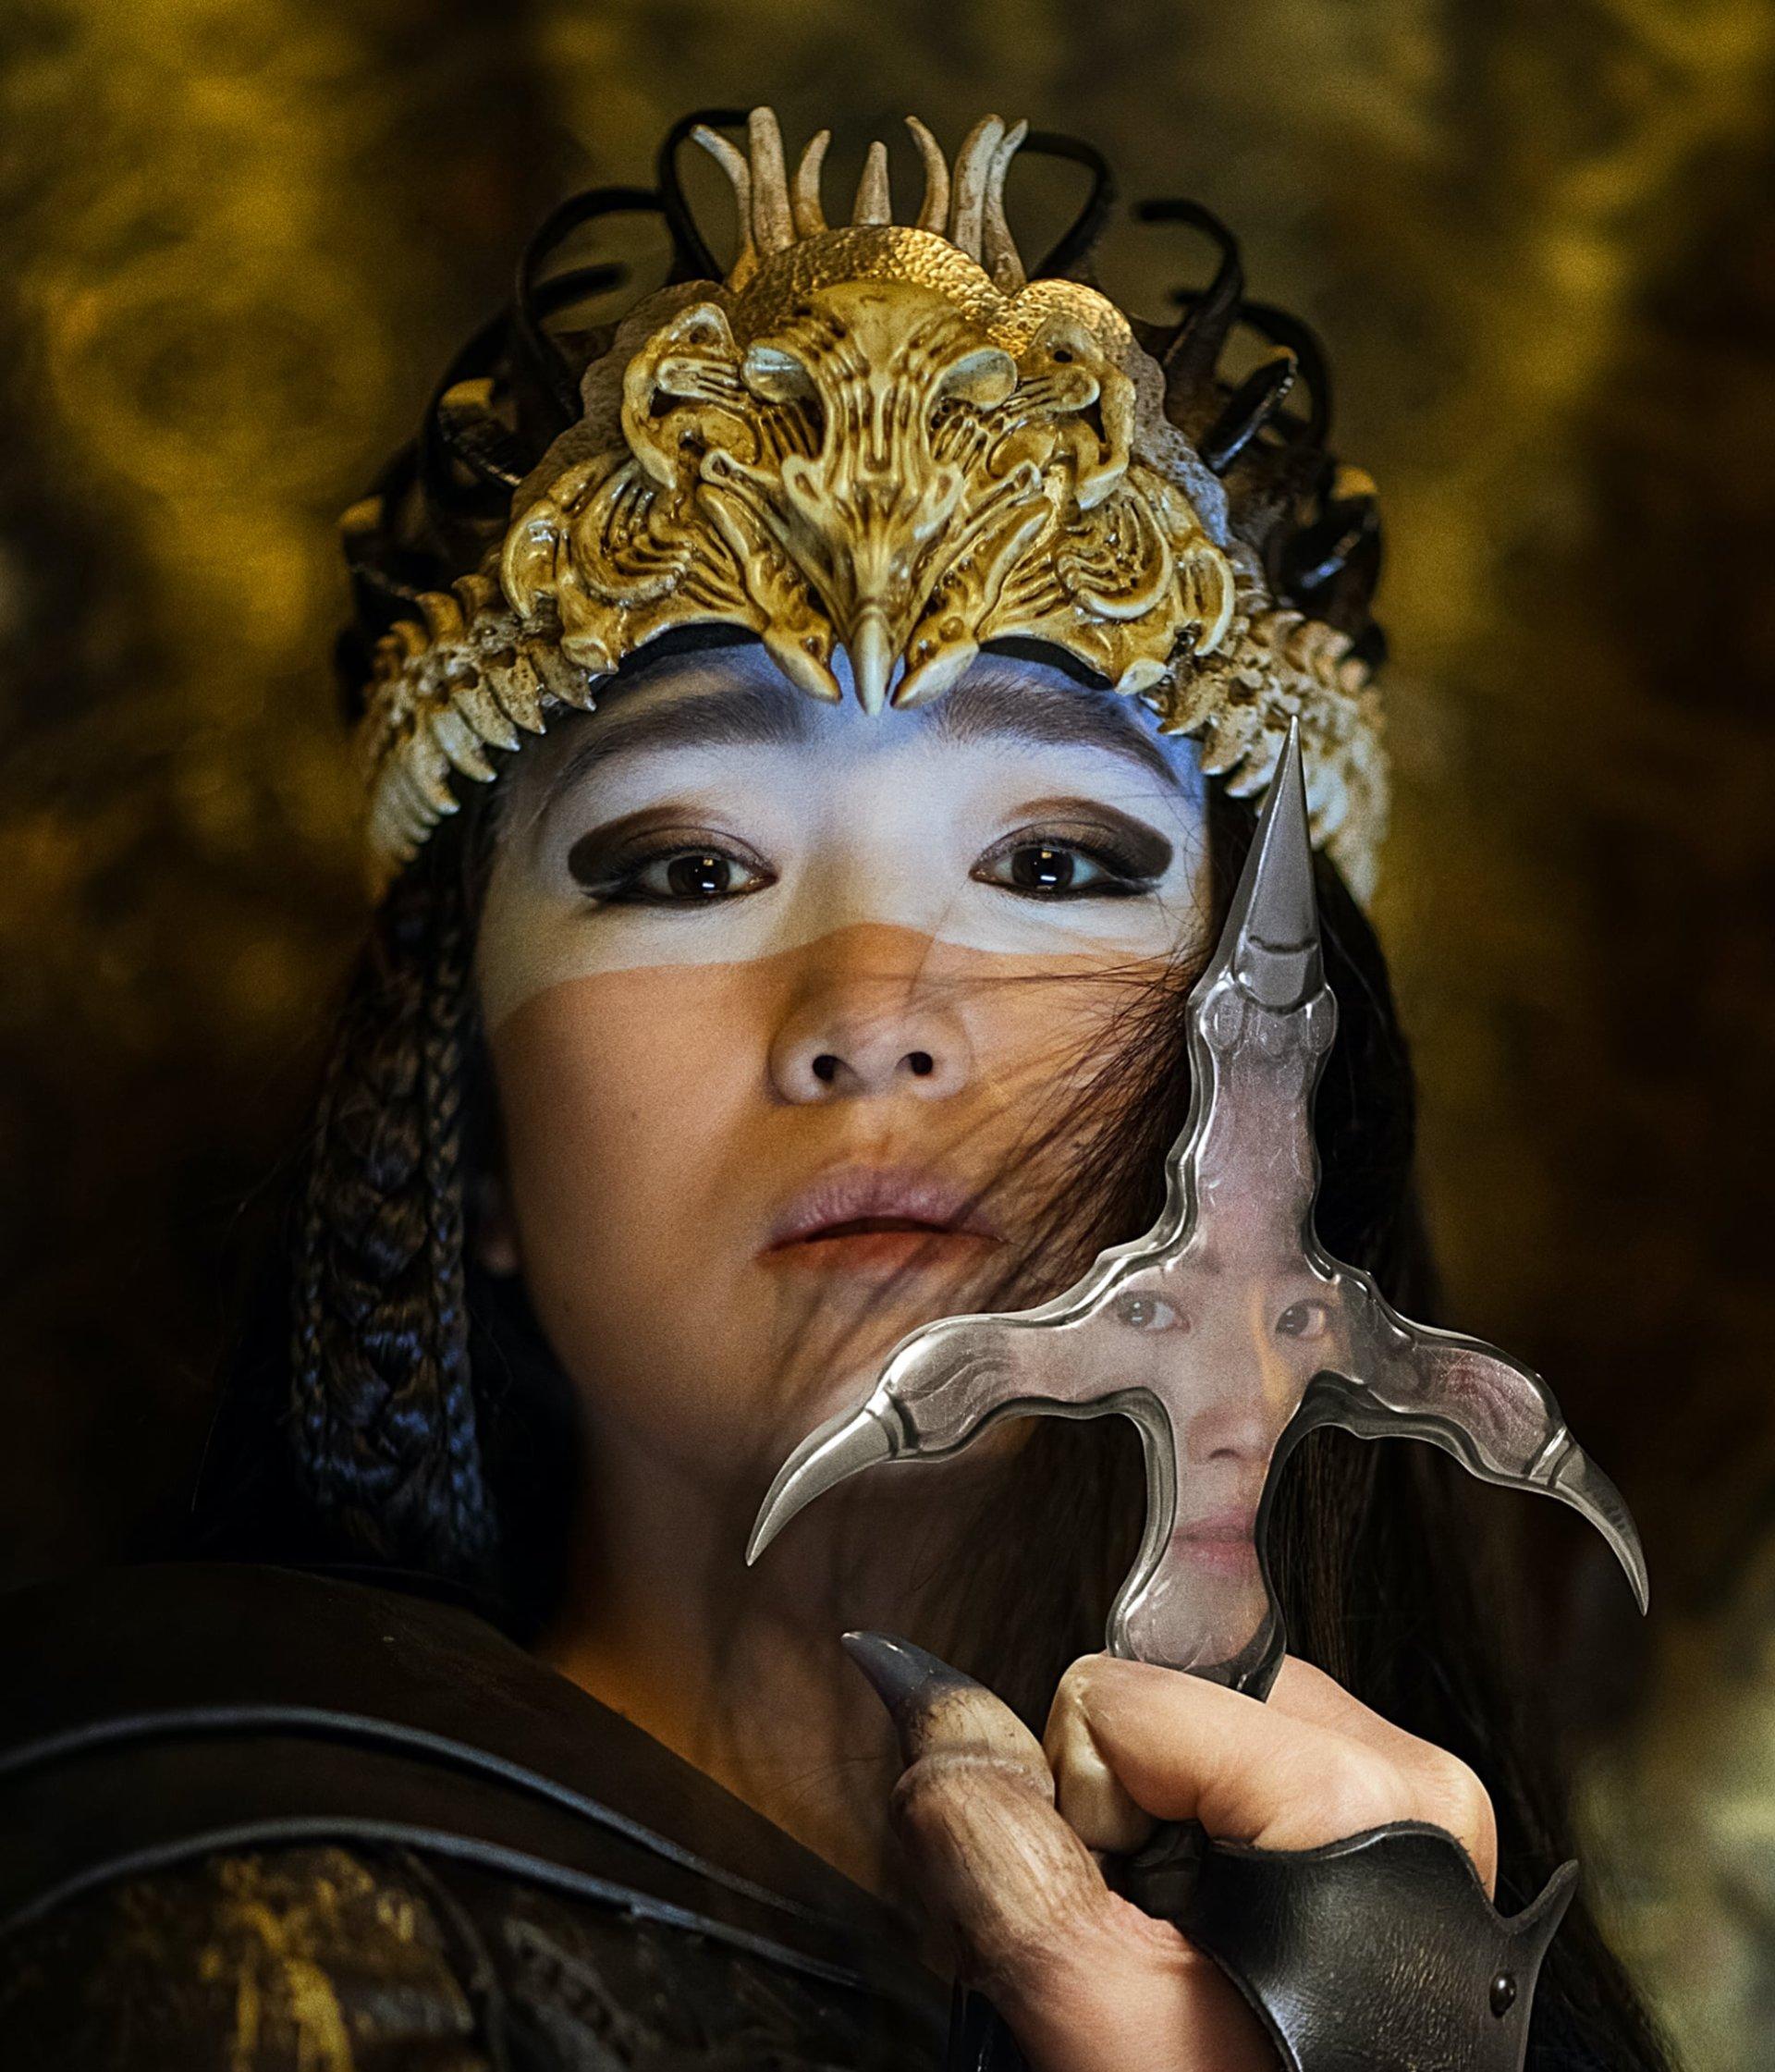 Nonton Film Mulan (2020) Mp4 Sub Indo LK21 | Chirpstory